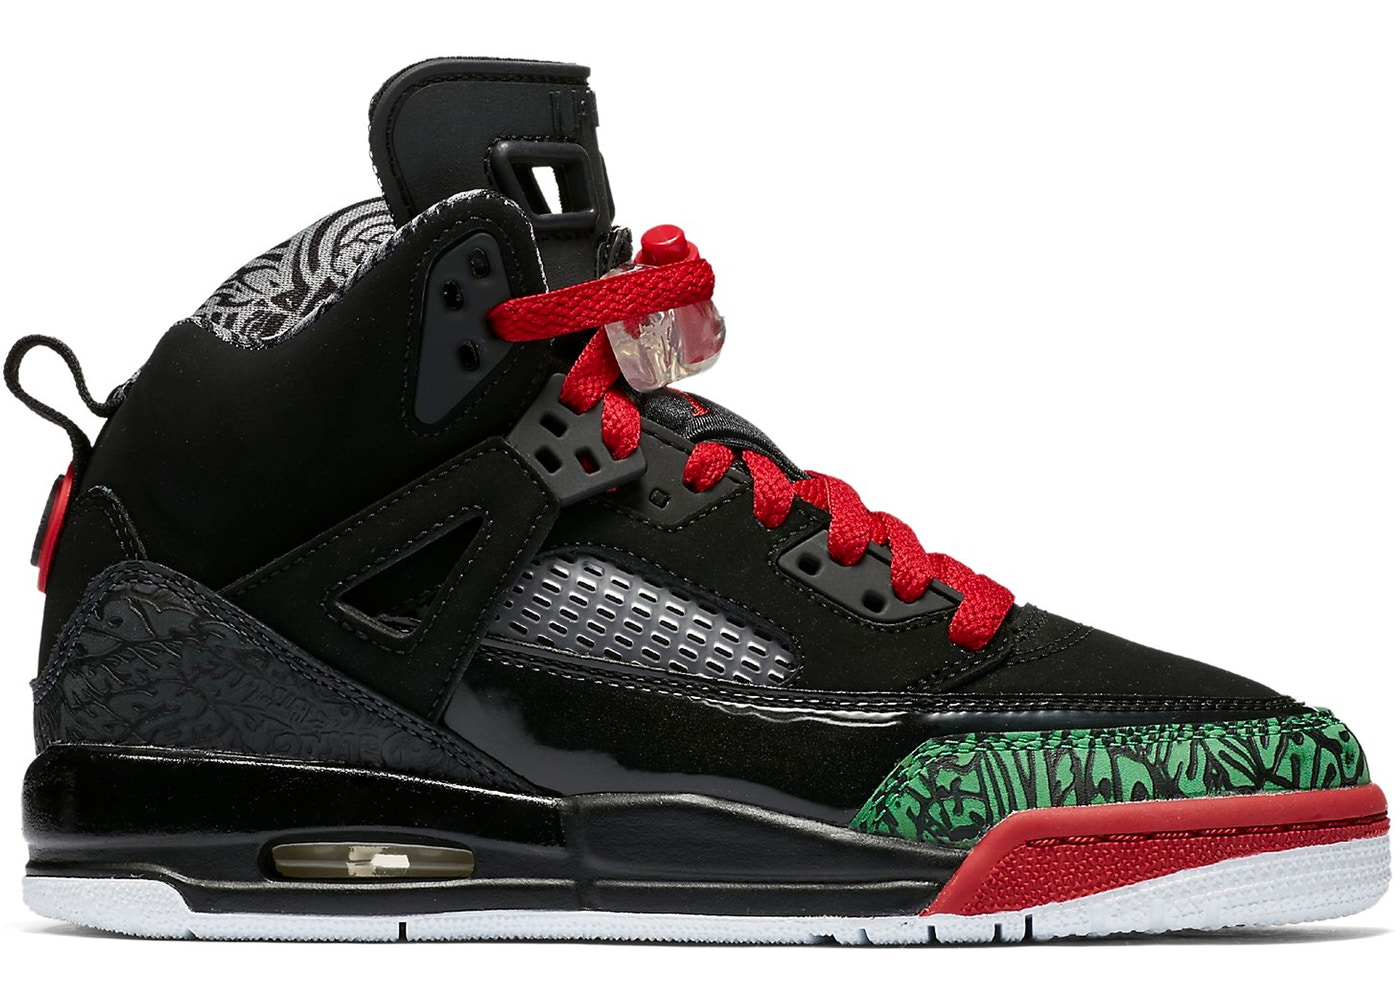 new styles 615f4 a3fb9 Buy Air Jordan Spizike Shoes & Deadstock Sneakers